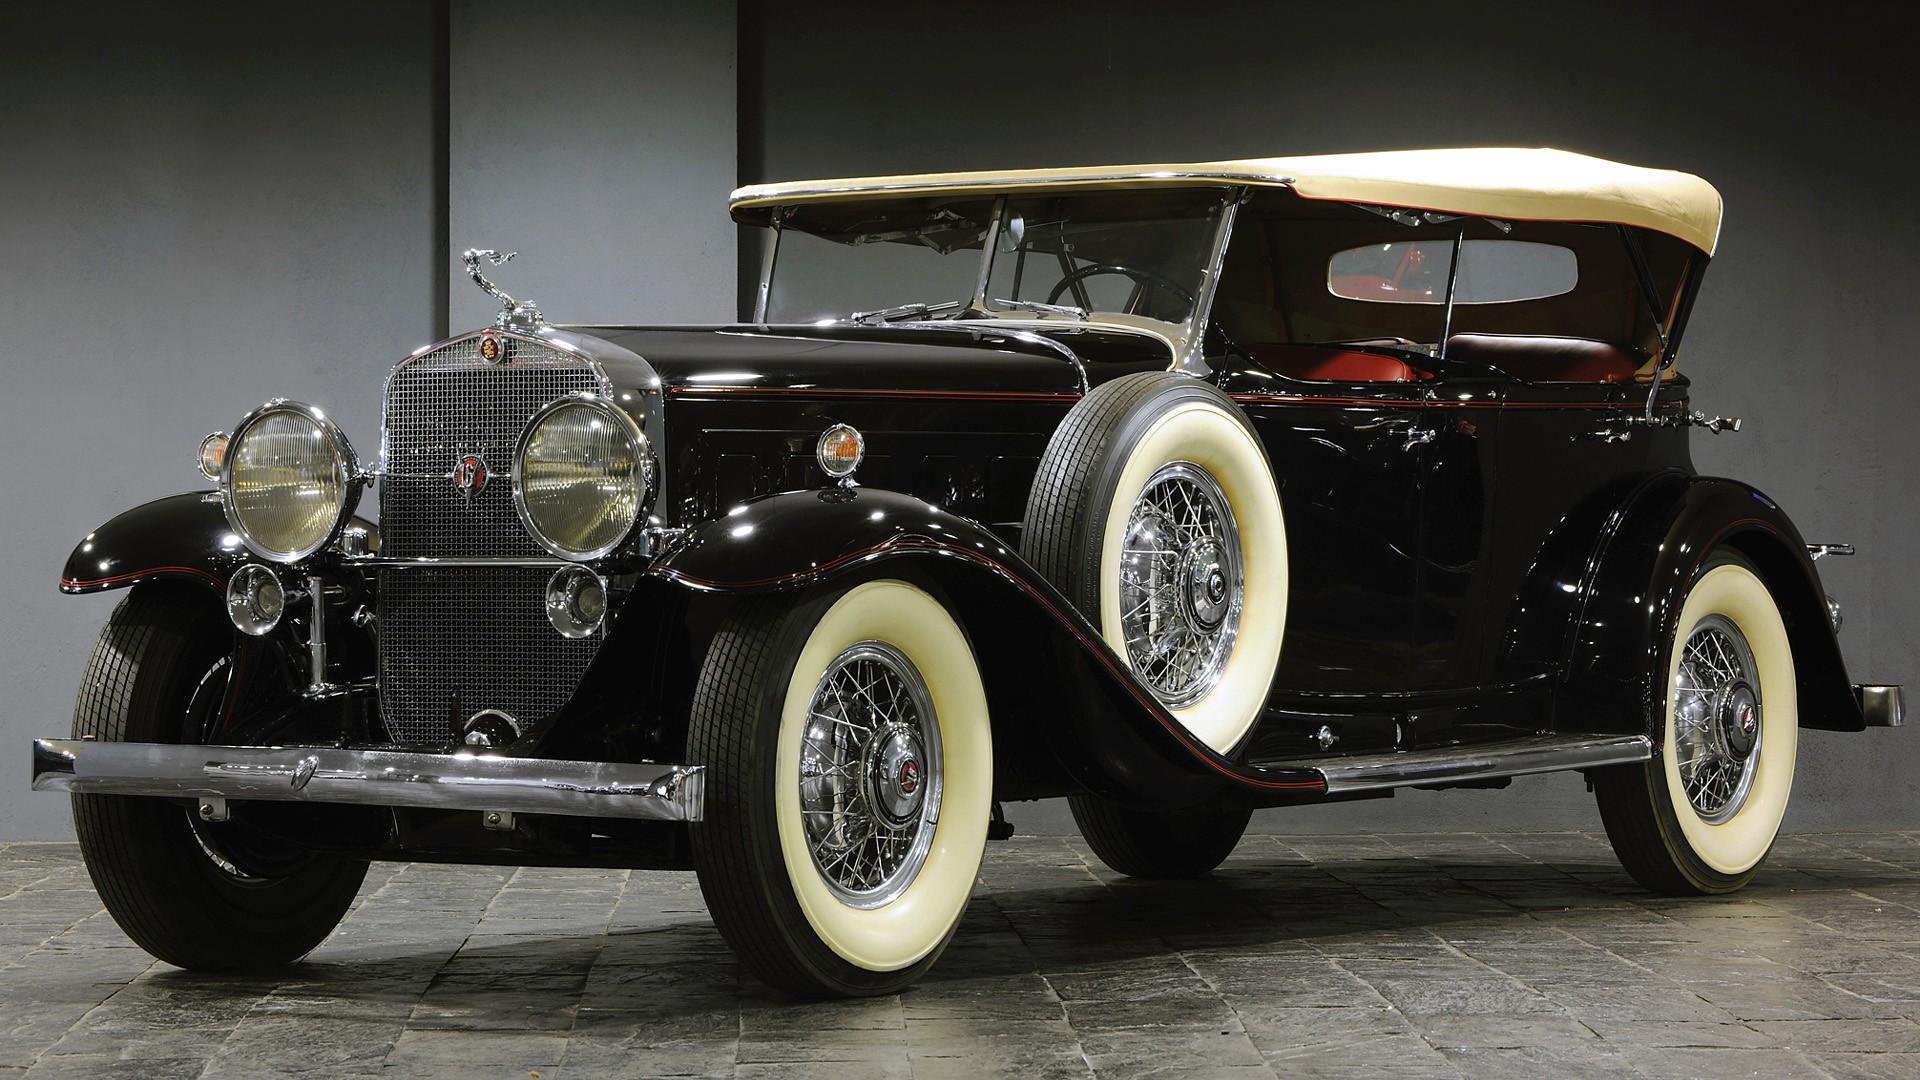 Cars Classic Wallpaper 1920x1080 Cars Classic Cars 1920x1080